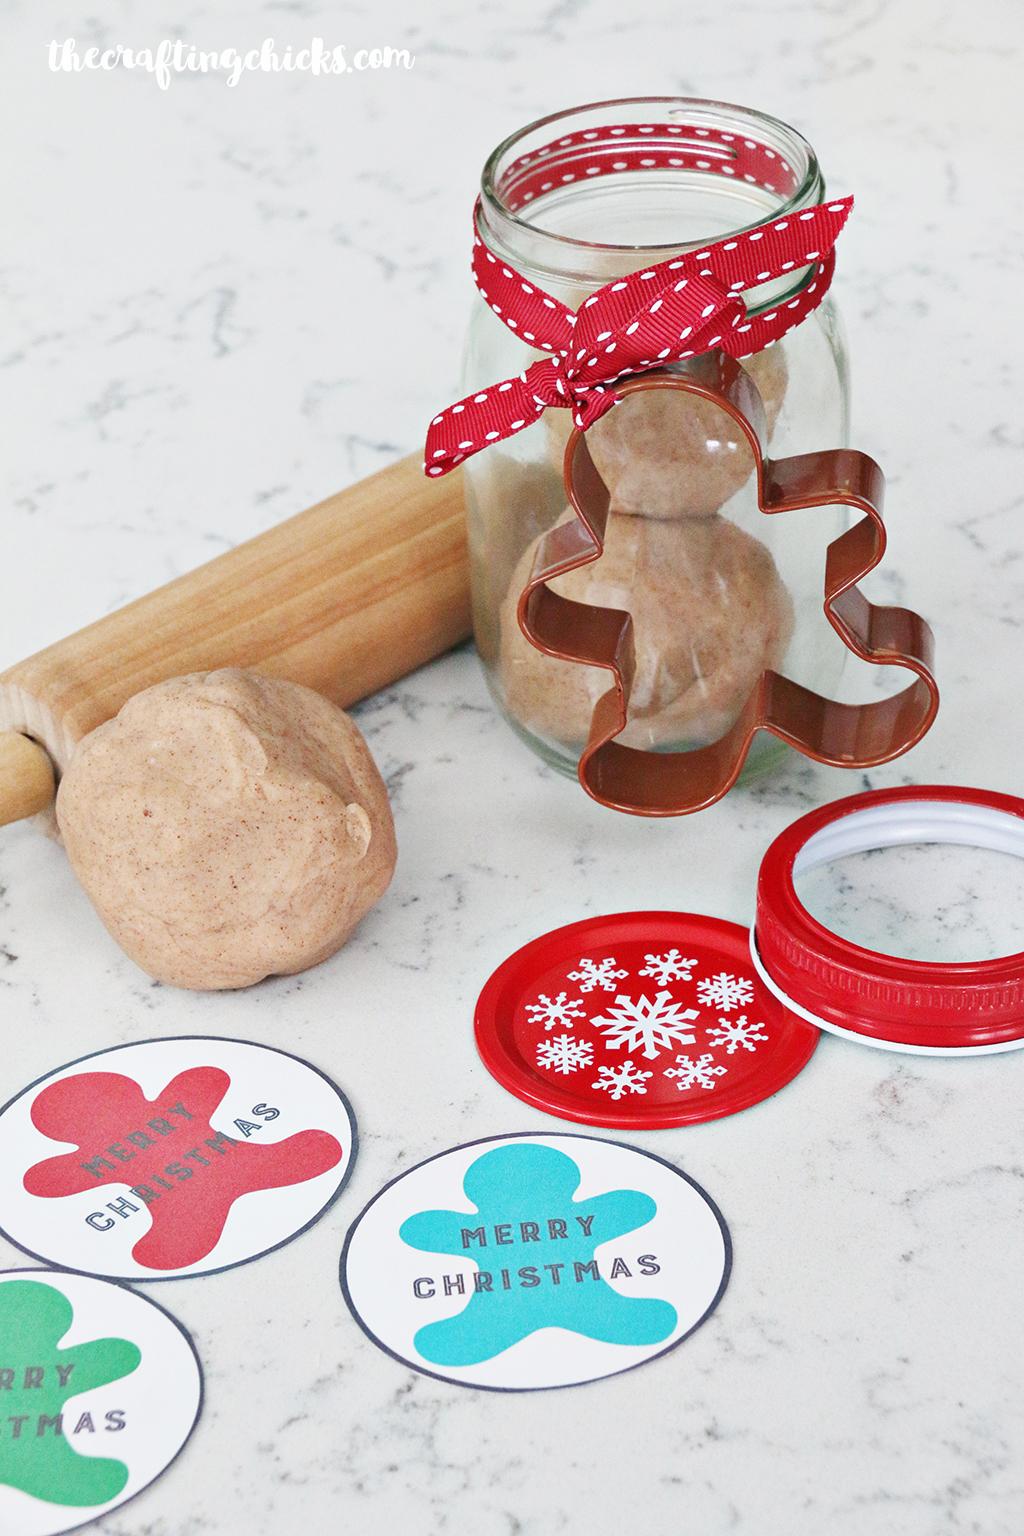 Gingerbread Gift Tag Printable - A simple Christmas neighbor gift idea